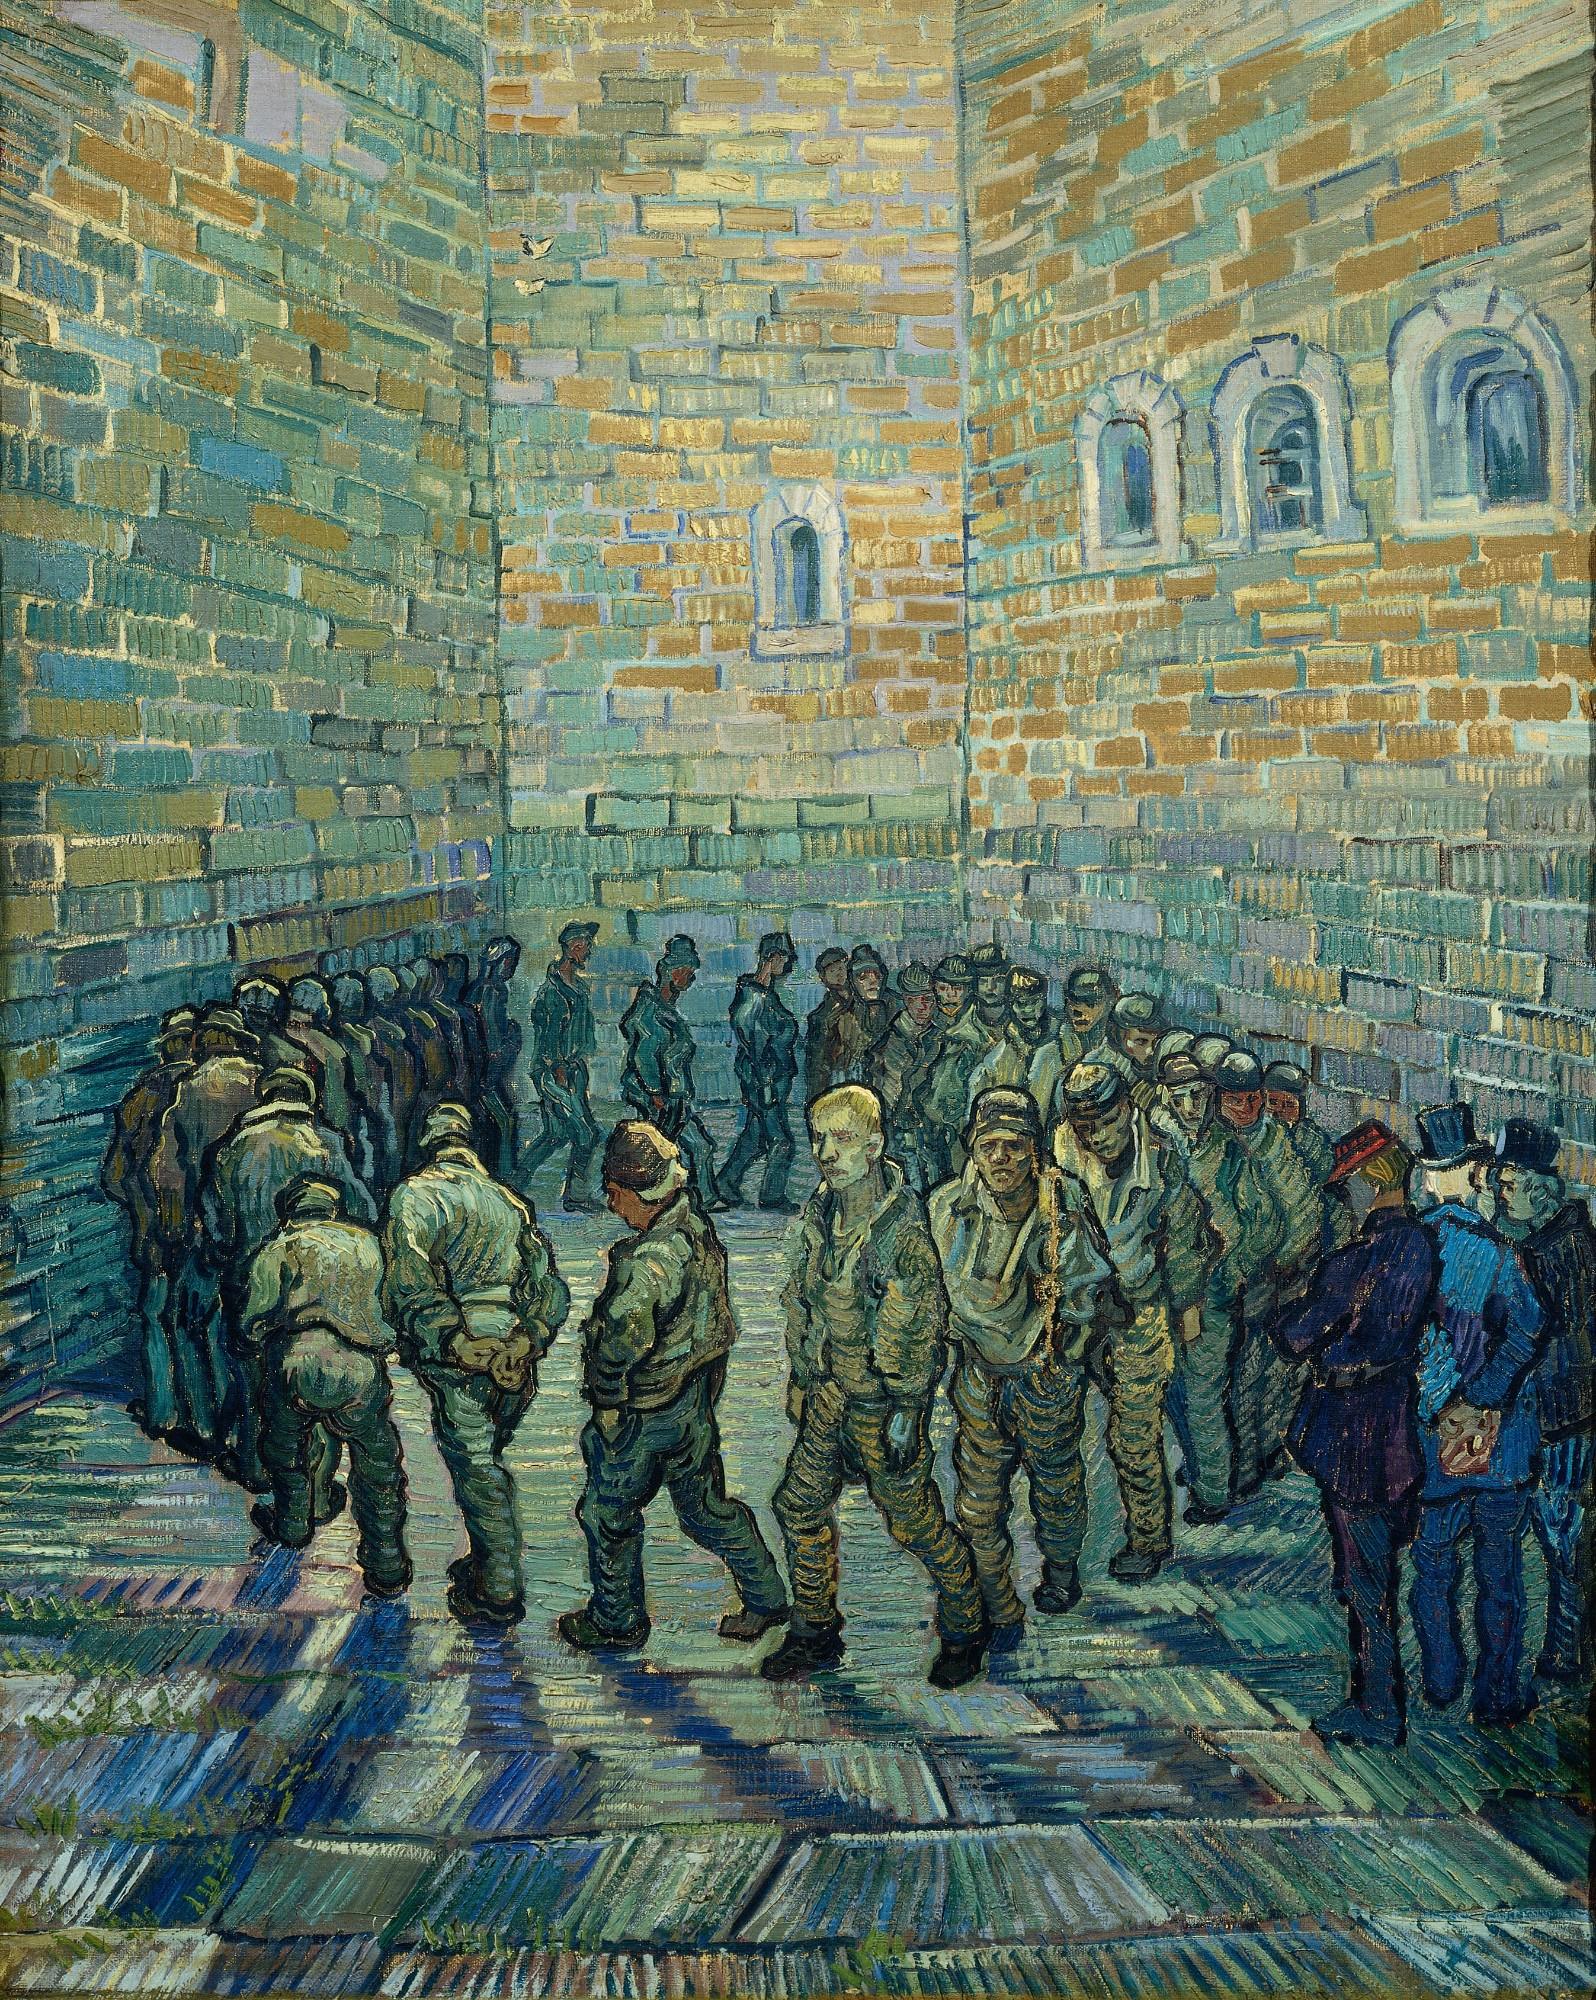 Vincent van Gogh - Prisoners Exercising